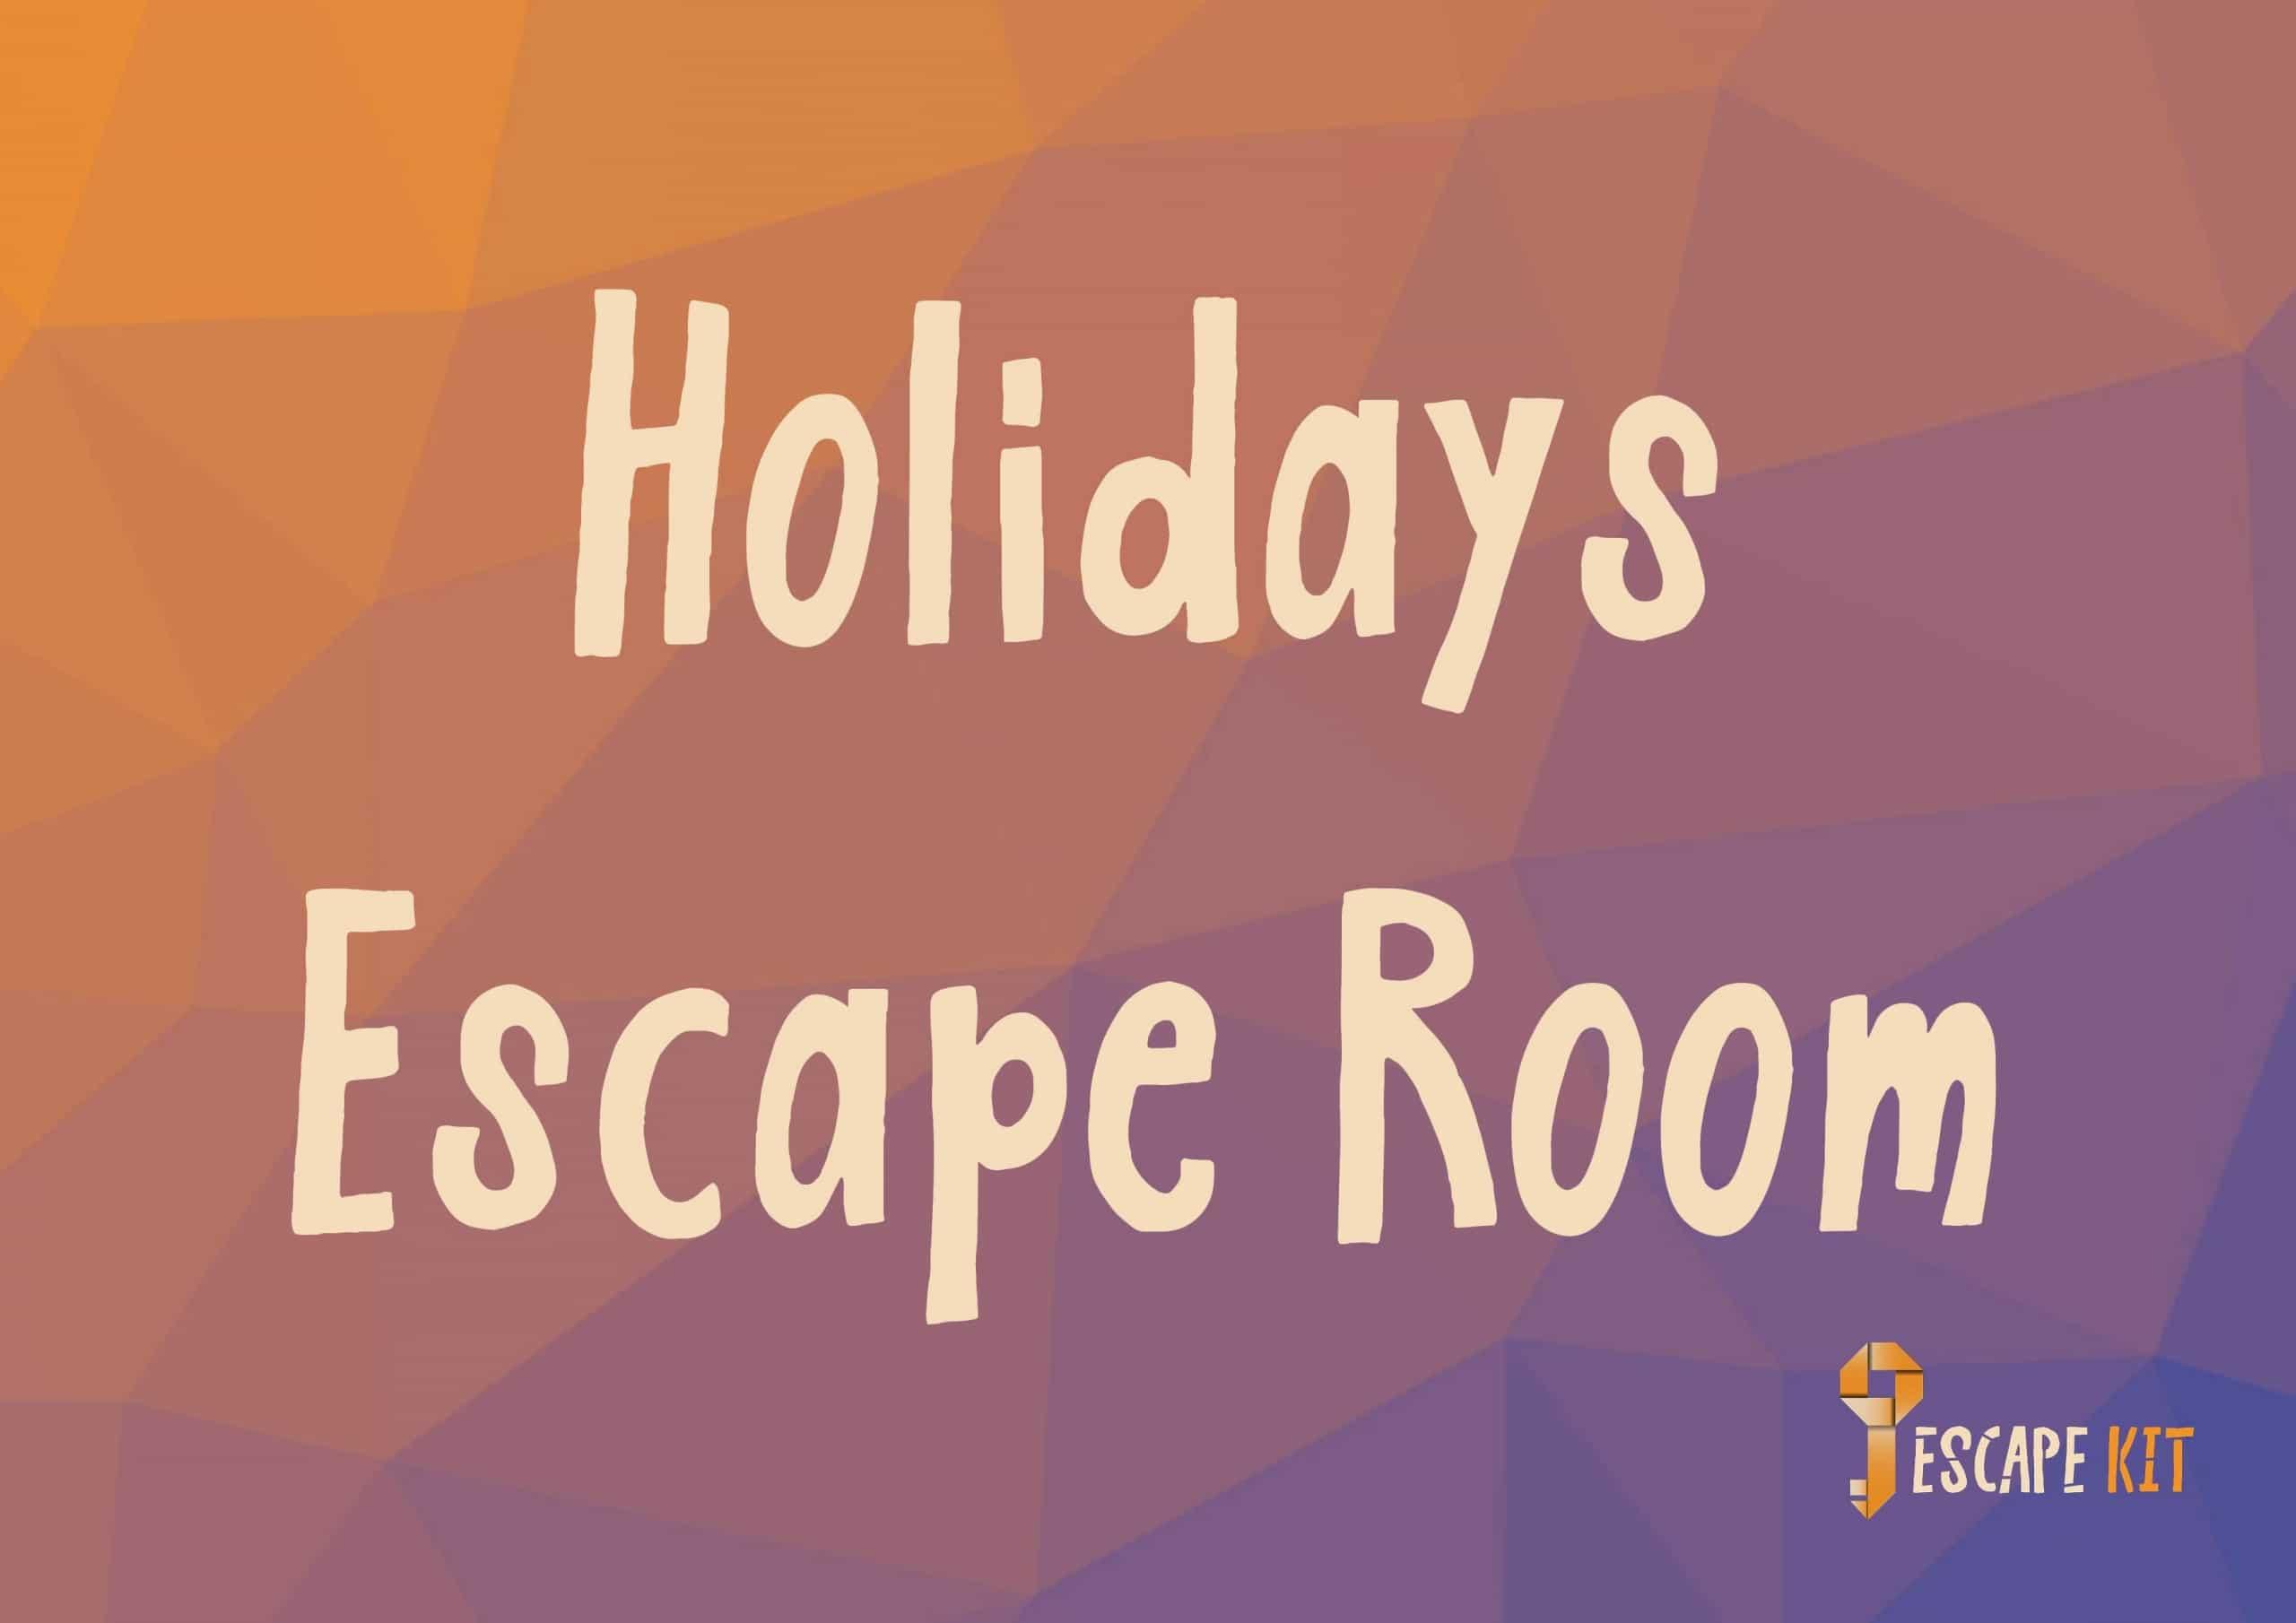 Holiday Escape Room